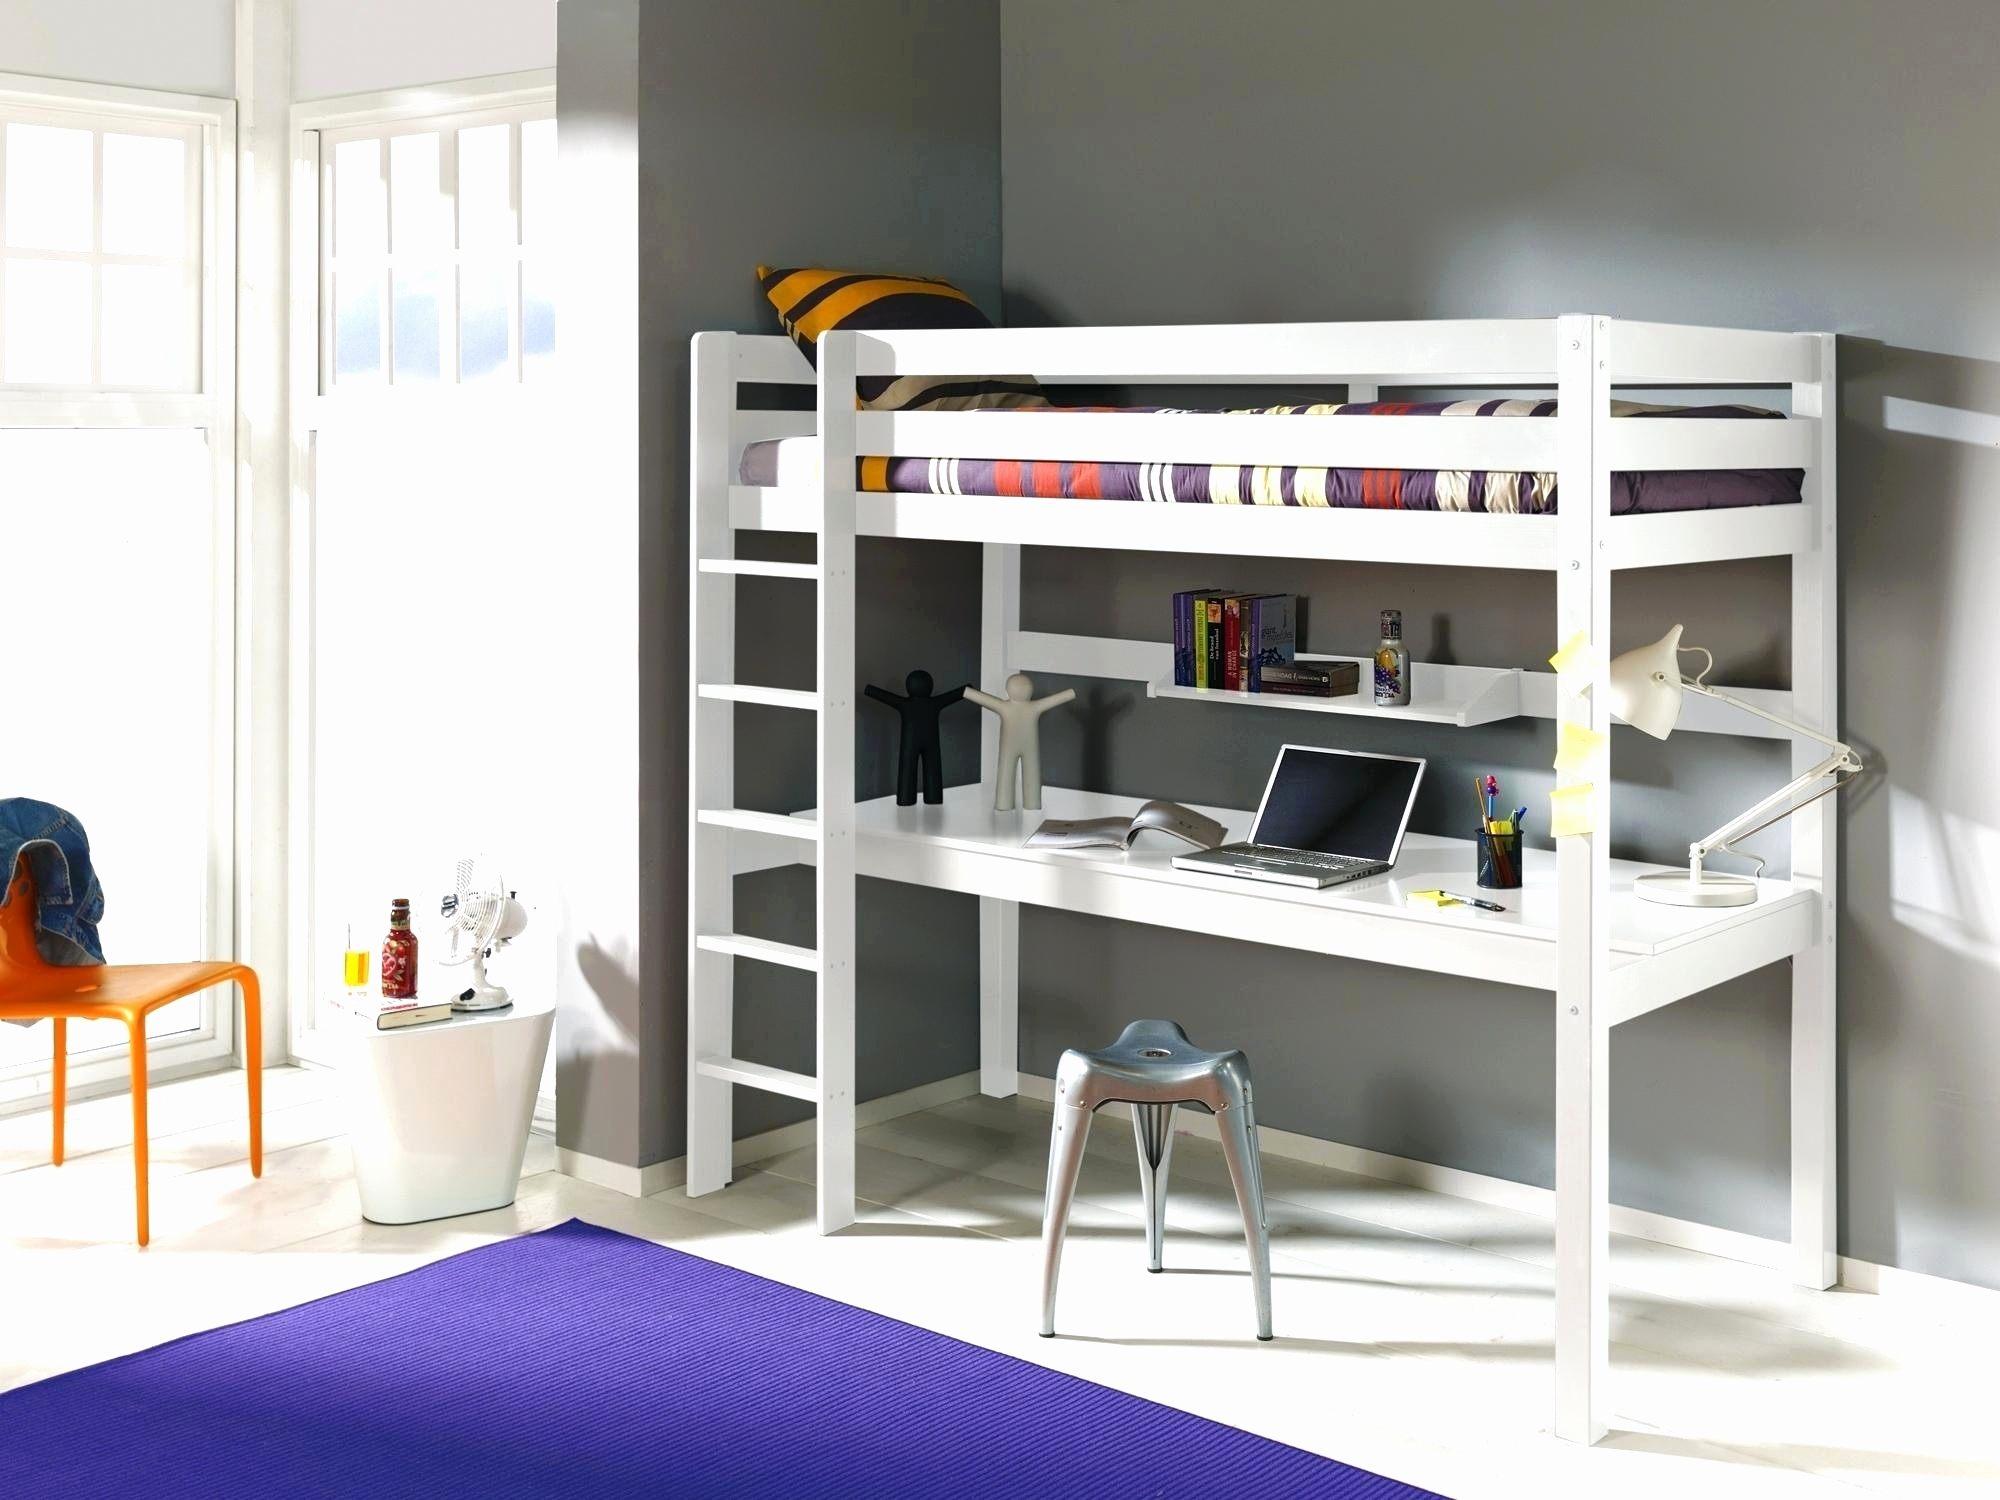 Lit Mezzanine Adulte 160×200 Le Luxe Chambre Mezzanine Adulte Nouveau Chambre Mezzanine Adulte Simple Lit